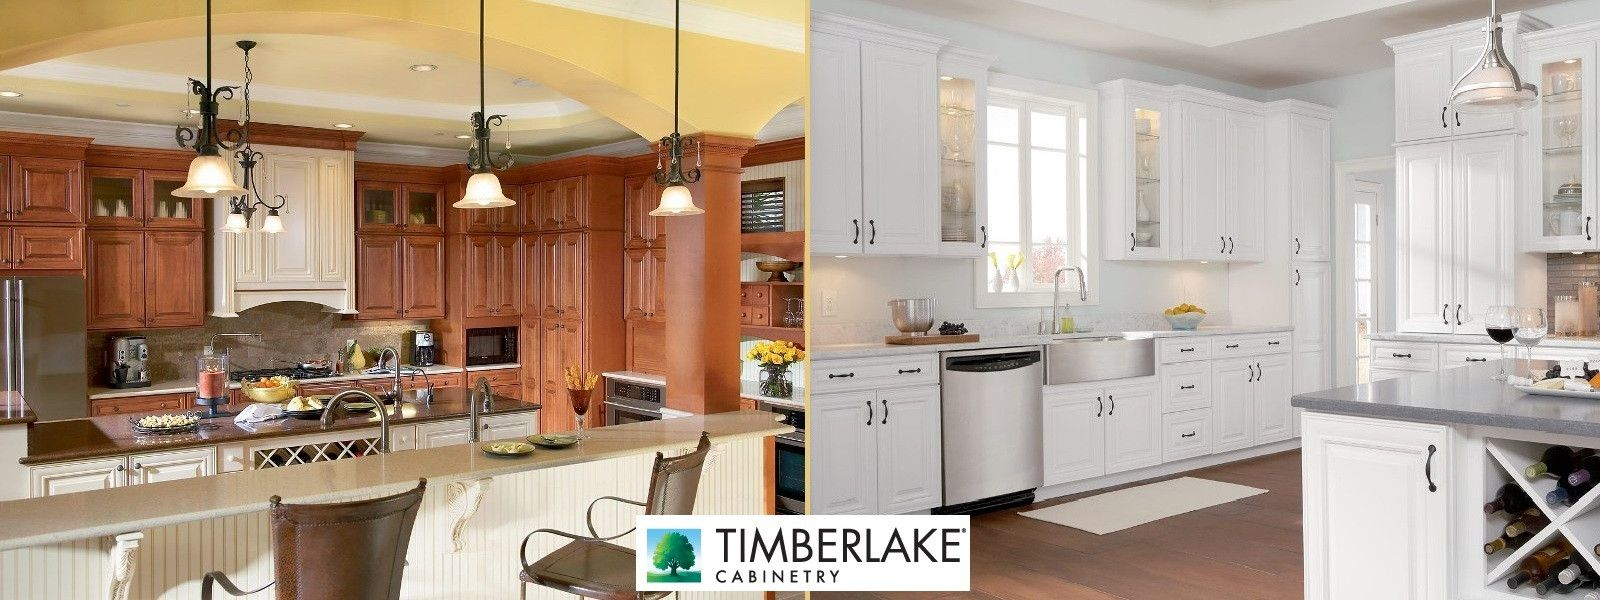 99+ Timberlake Kitchen Cabinets Reviews - Unique Kitchen Backsplash ...